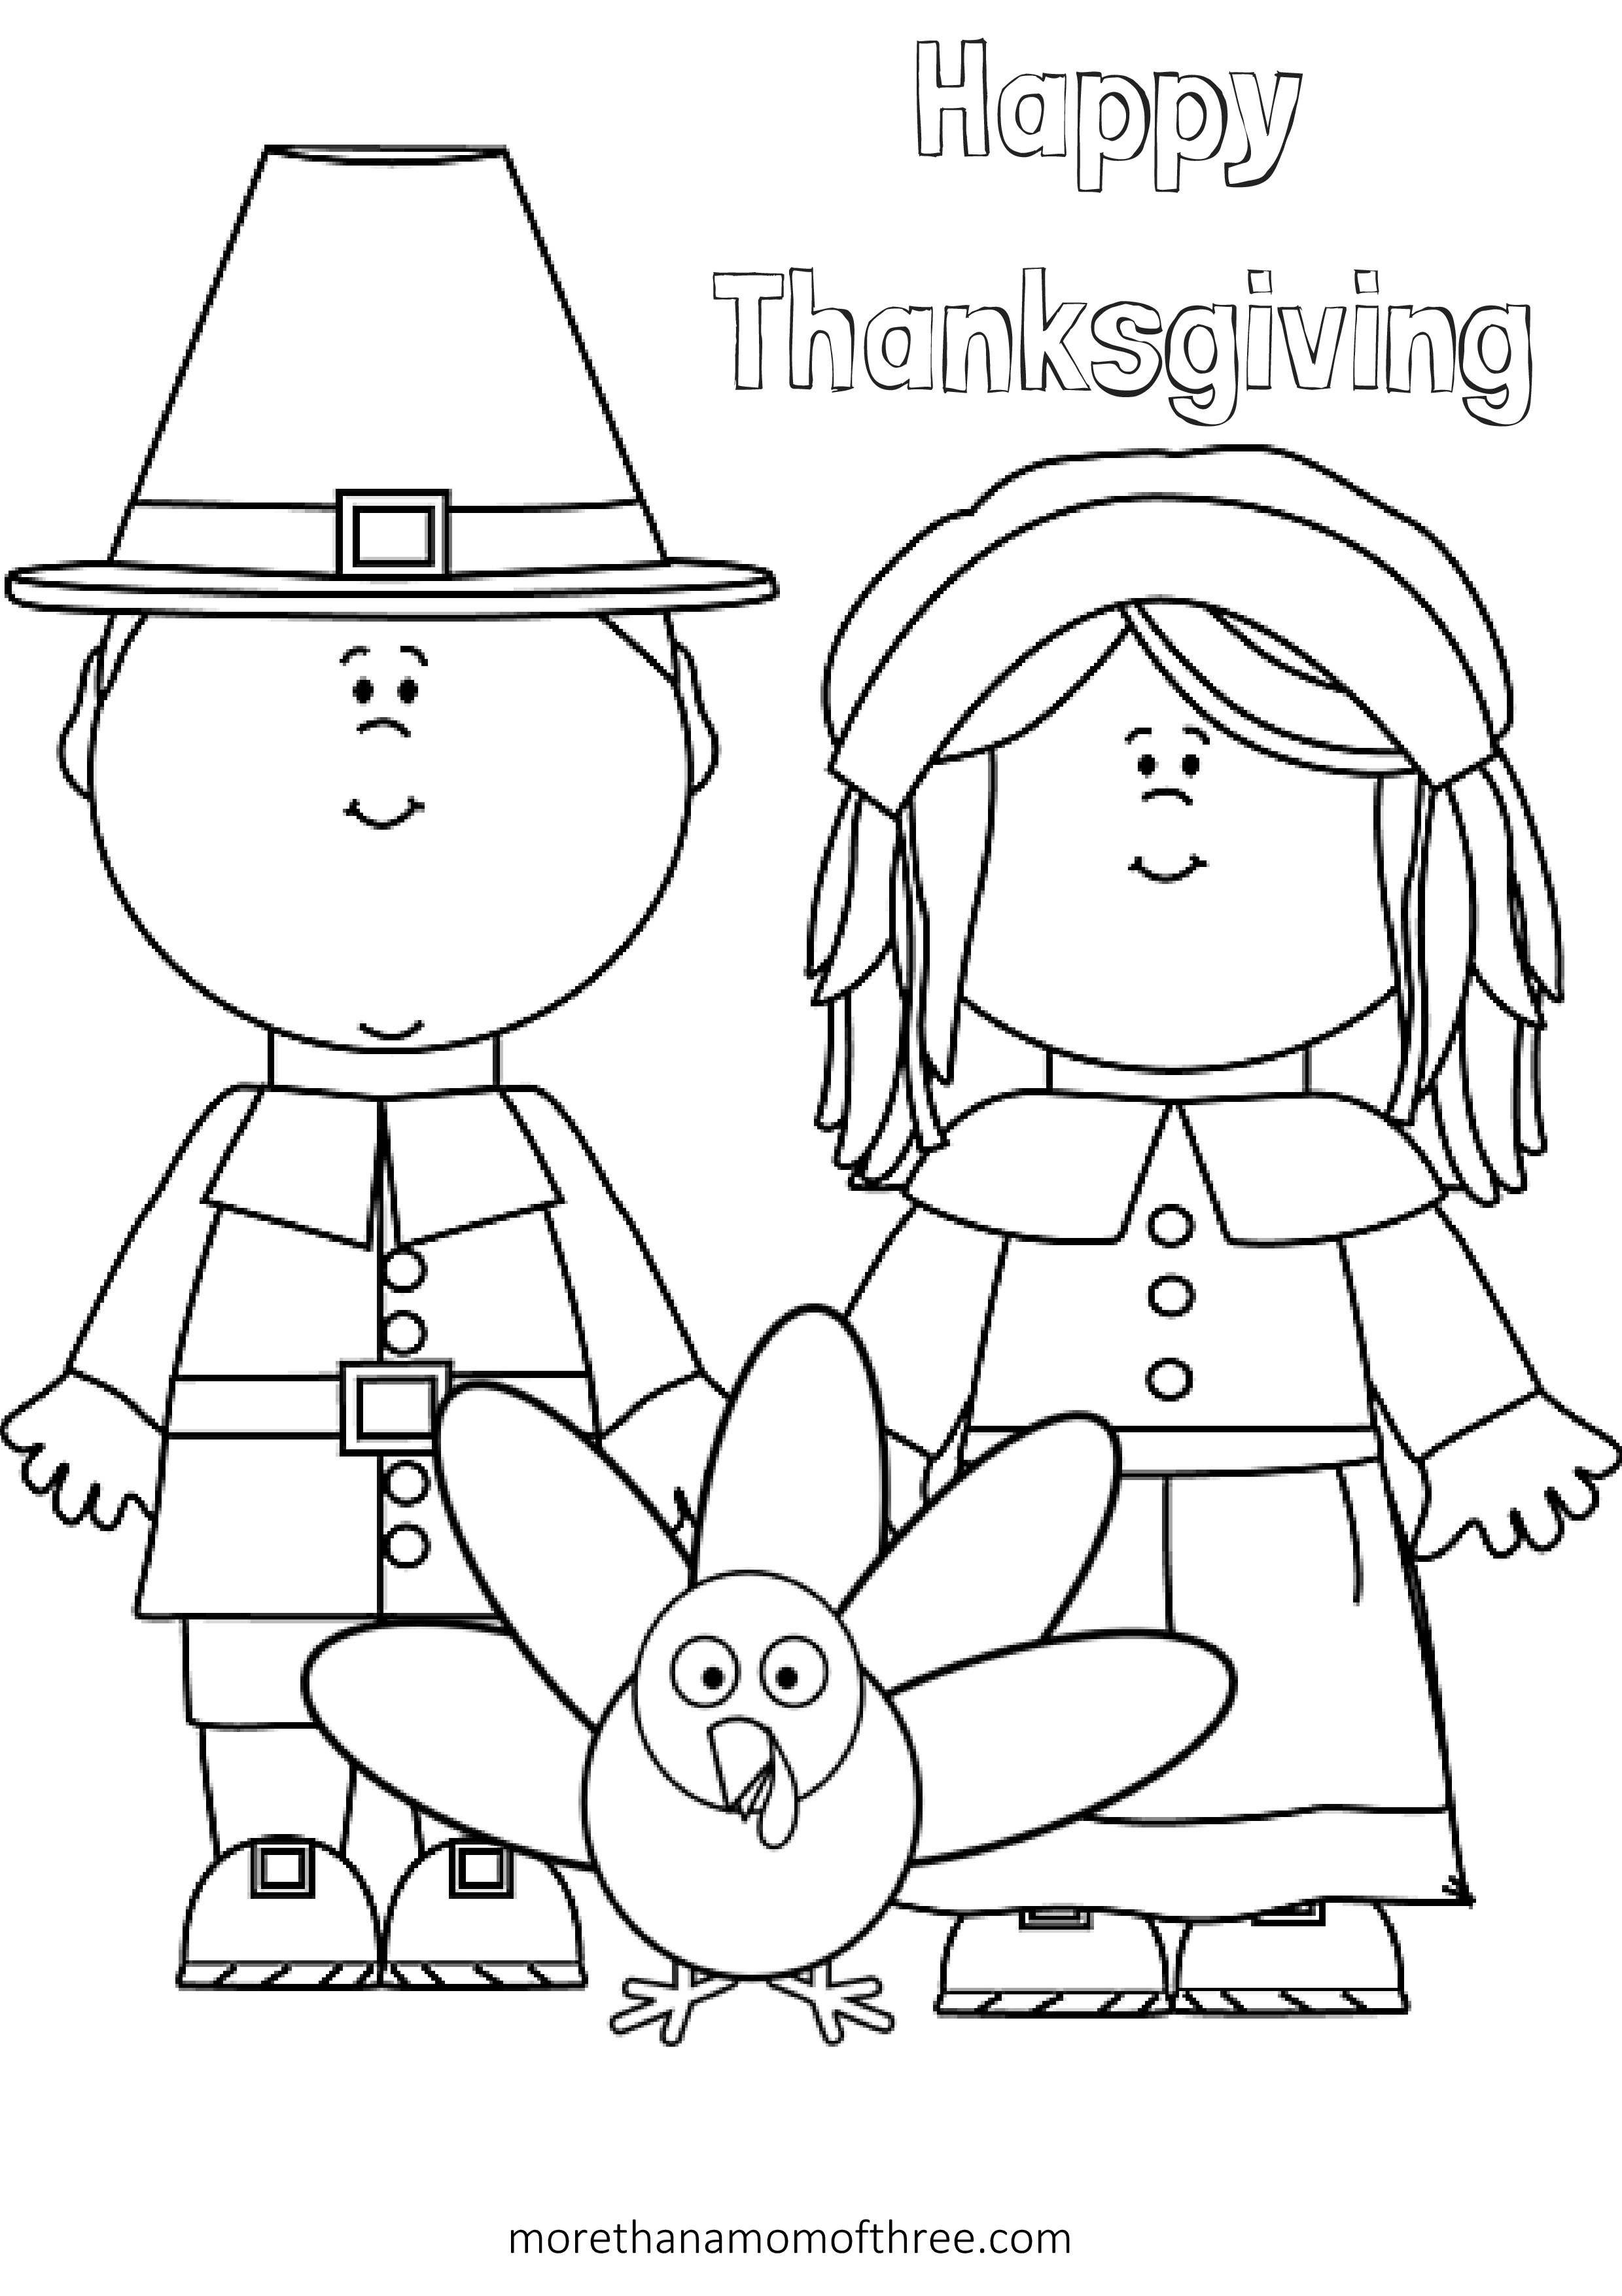 Happy Thanksgiving Jpg Jpeg Image 2479 3509 Pixels Scaled 17 Thanksgiving Coloring Sheets Free Thanksgiving Coloring Pages Thanksgiving Coloring Pages